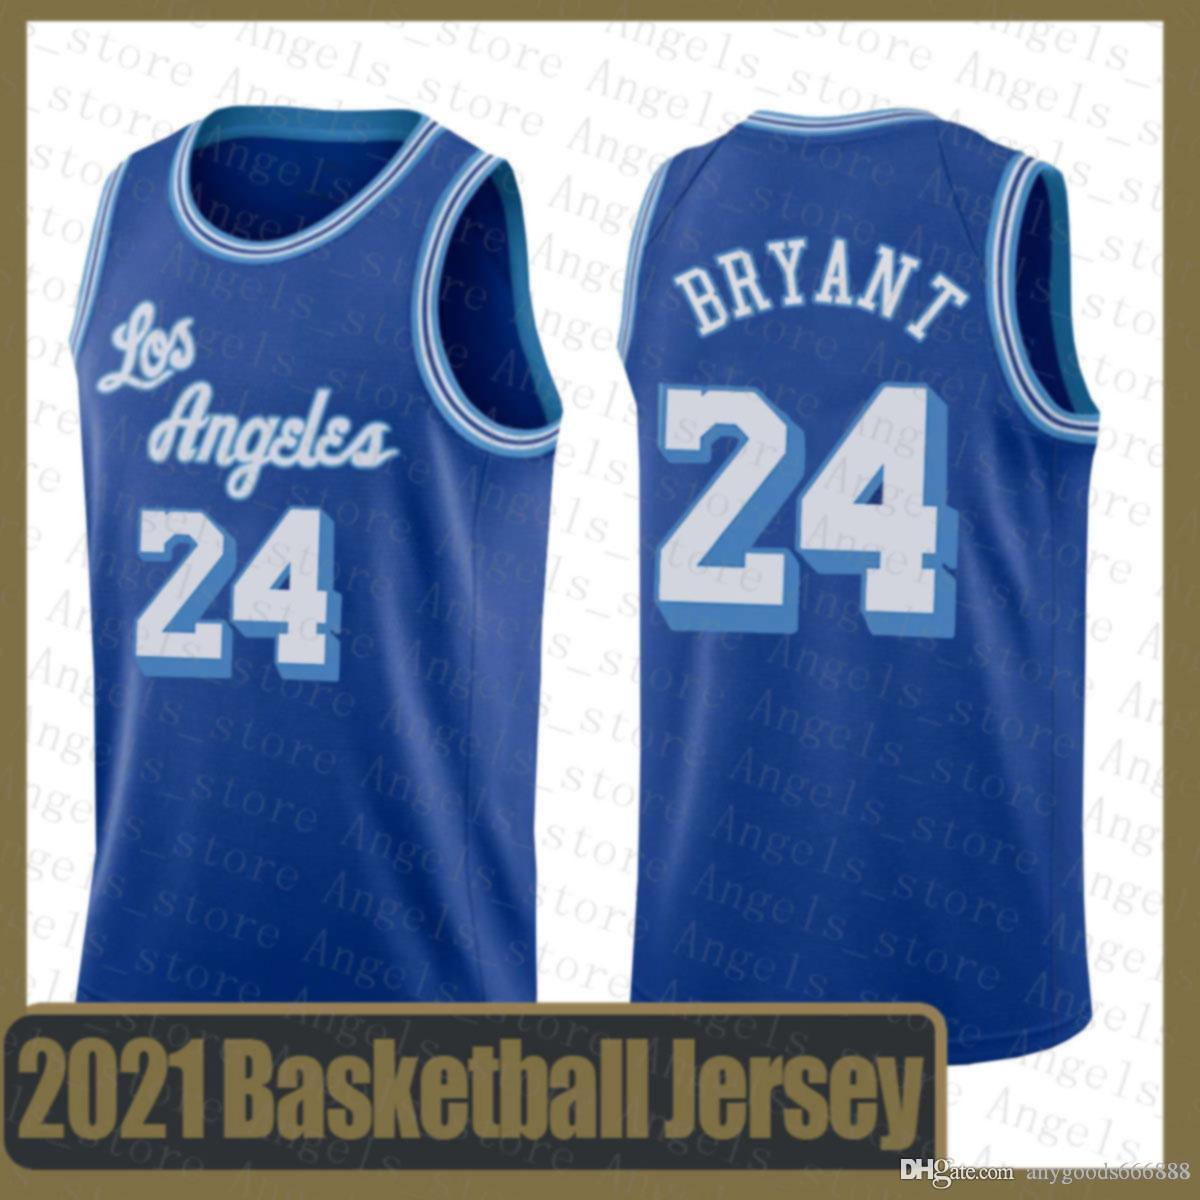 Ncaa los angeles.Lakers.Kobe.24.Bryant Basketball Jersey 2020 2021 New Kawhi Ja 12 Morans Leonard Zion 1 Williamson Dwyane 3